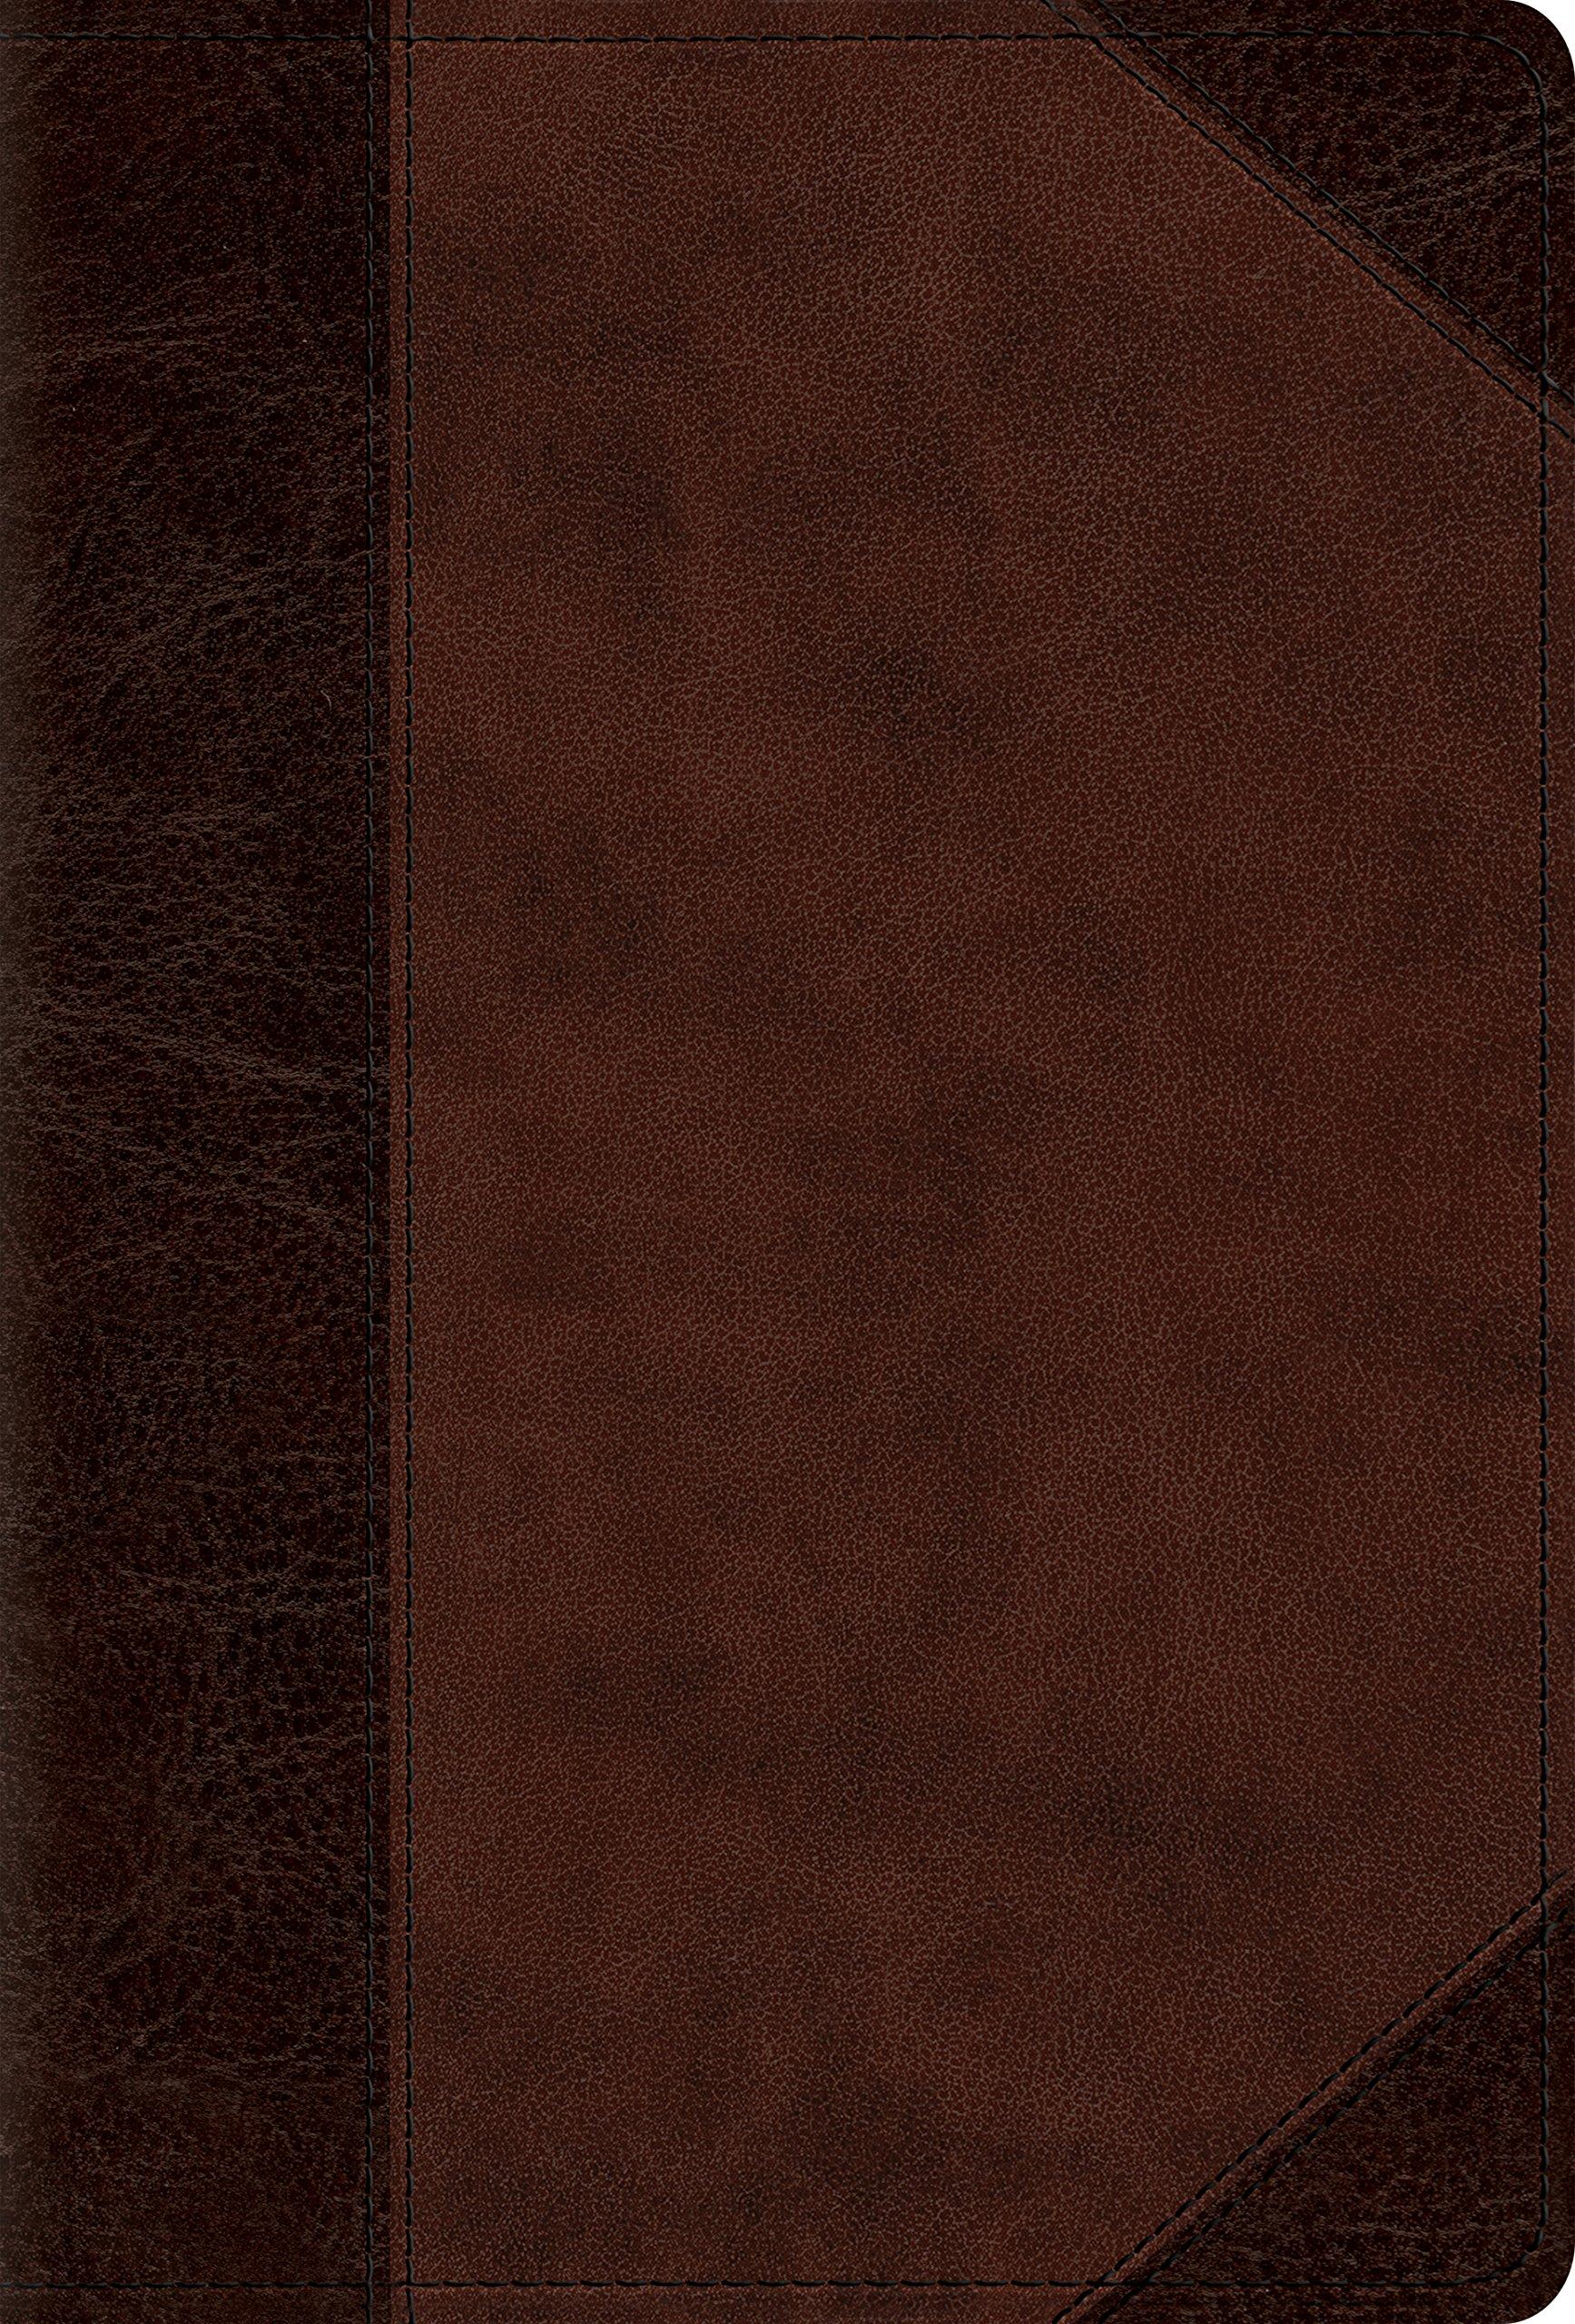 Devotional Psalter TruTone Walnut Portfolio product image